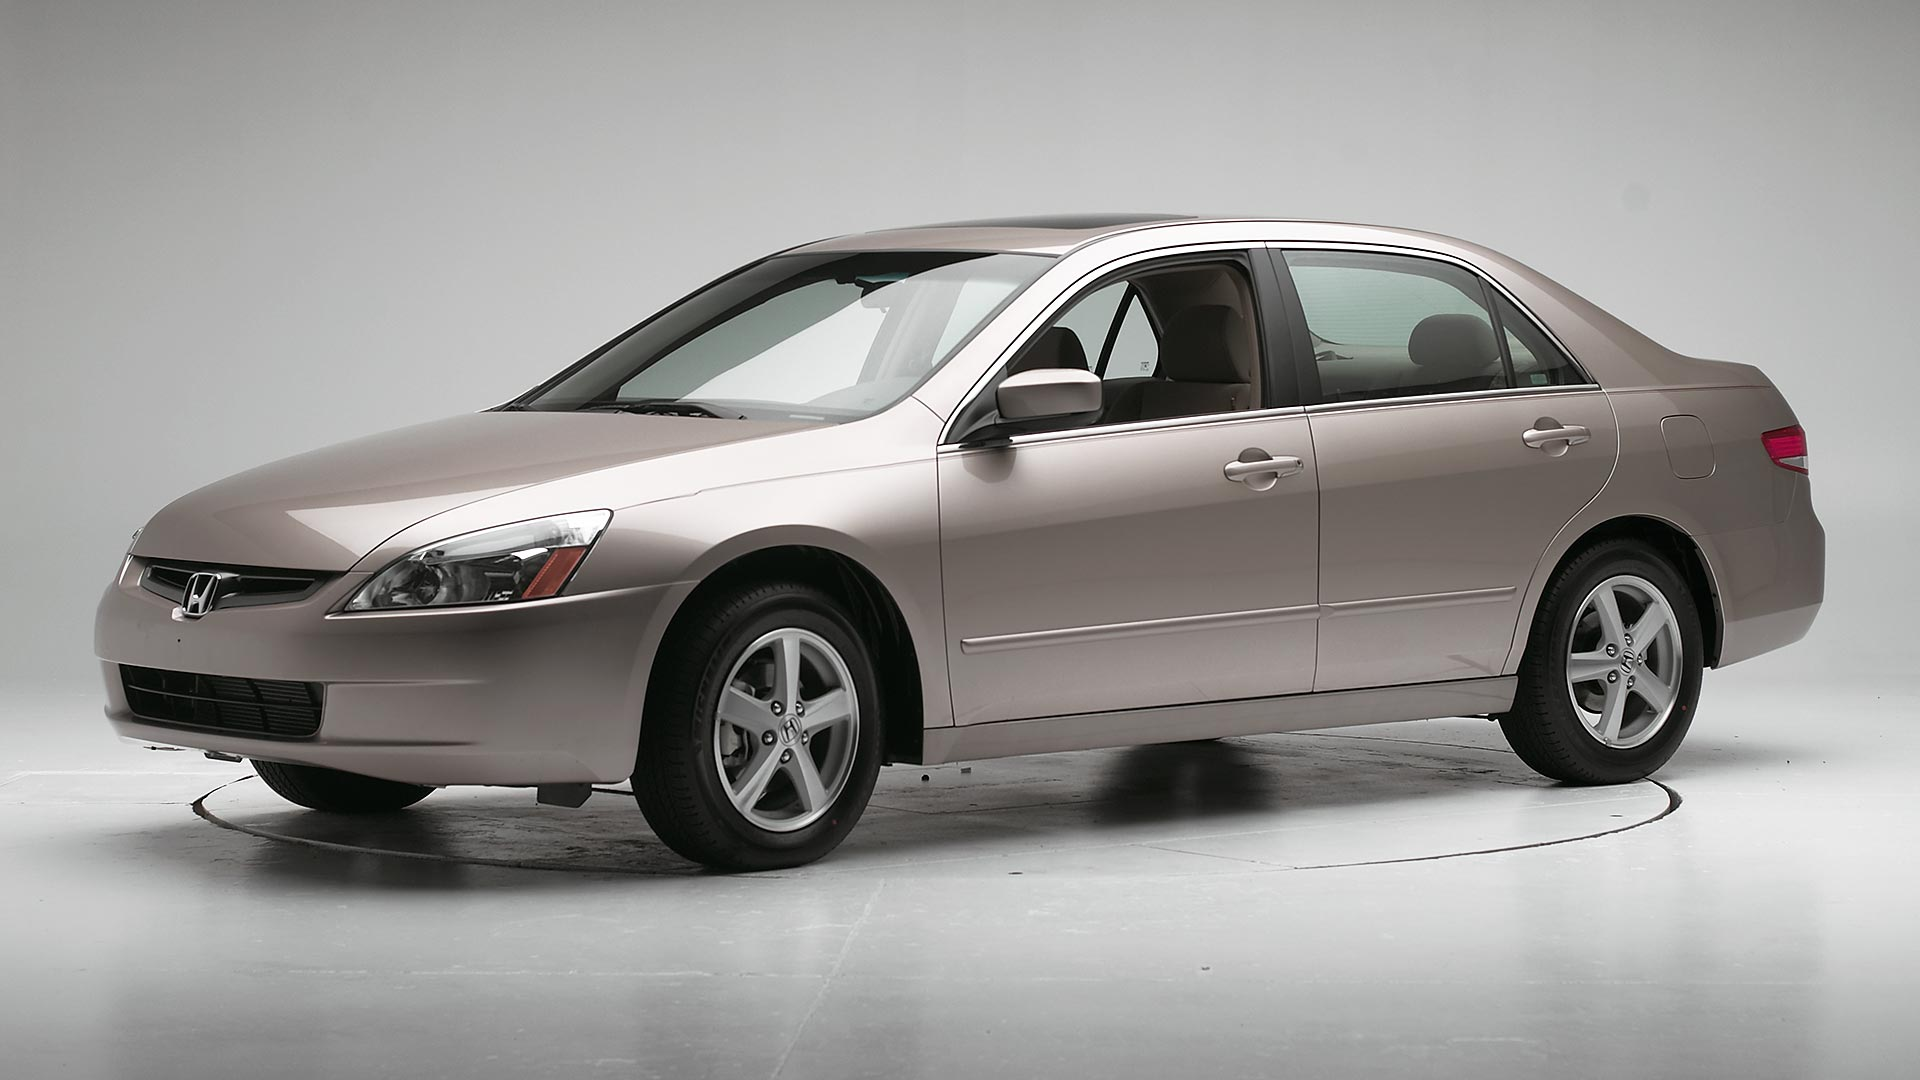 Kelebihan Accord 2003 Top Model Tahun Ini